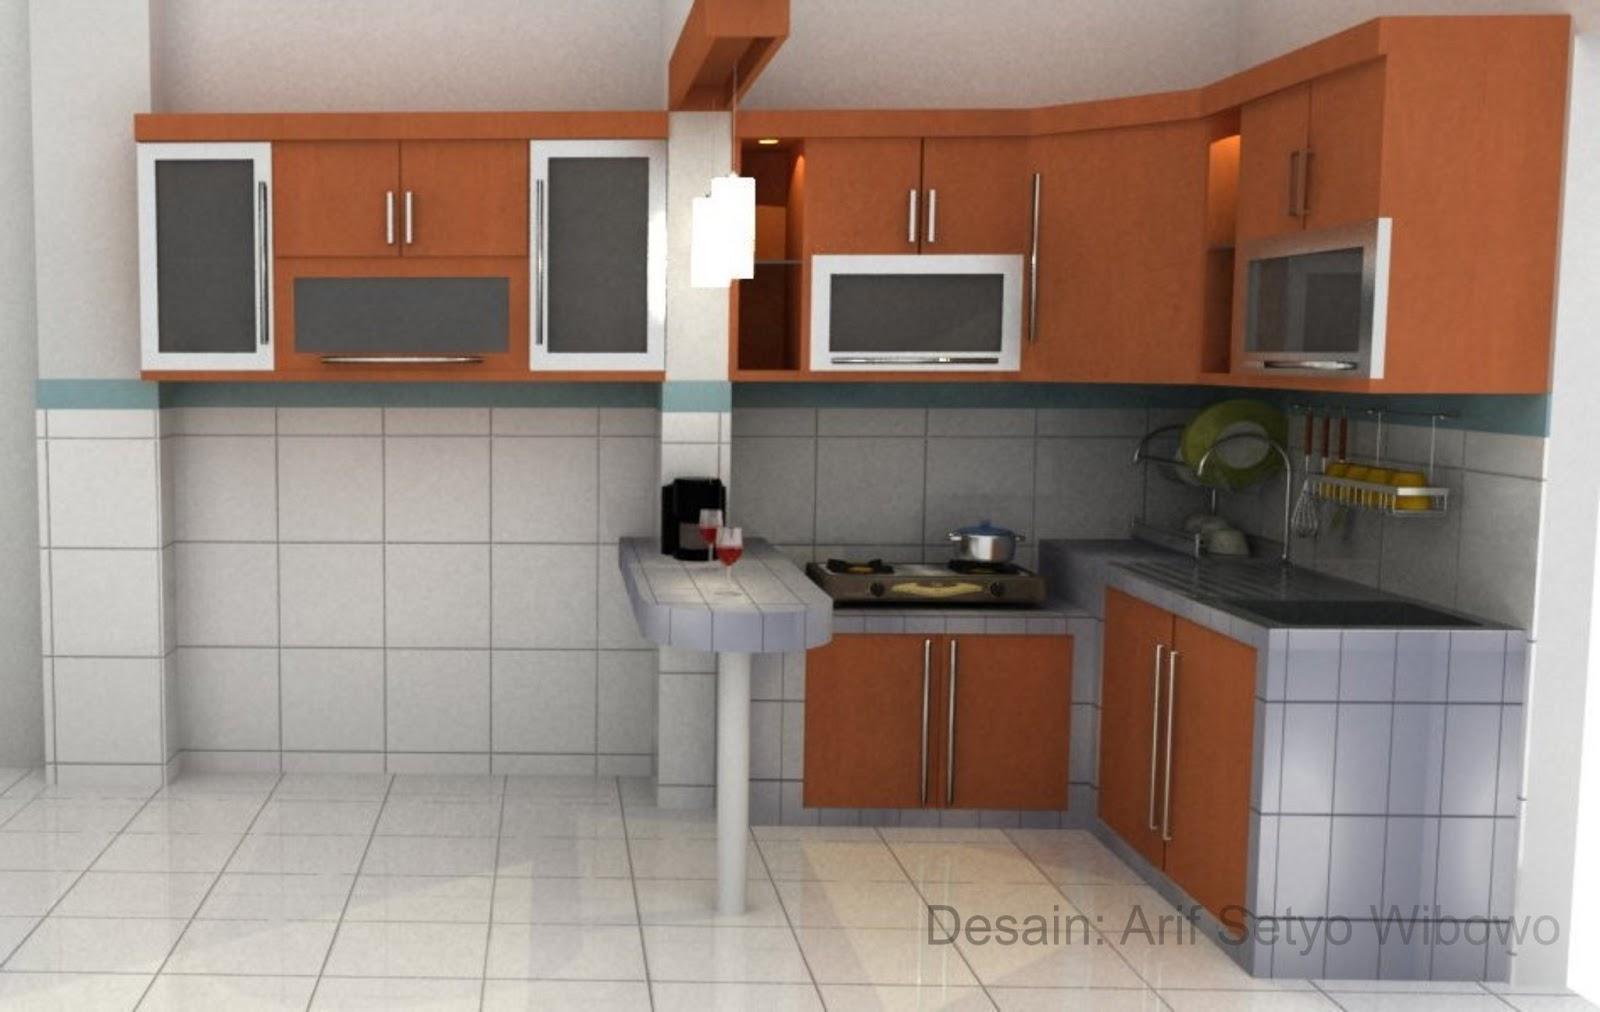 Pin gambar kabinet dapur moden pelautscom on pinterest for Gambar kitchen set aluminium